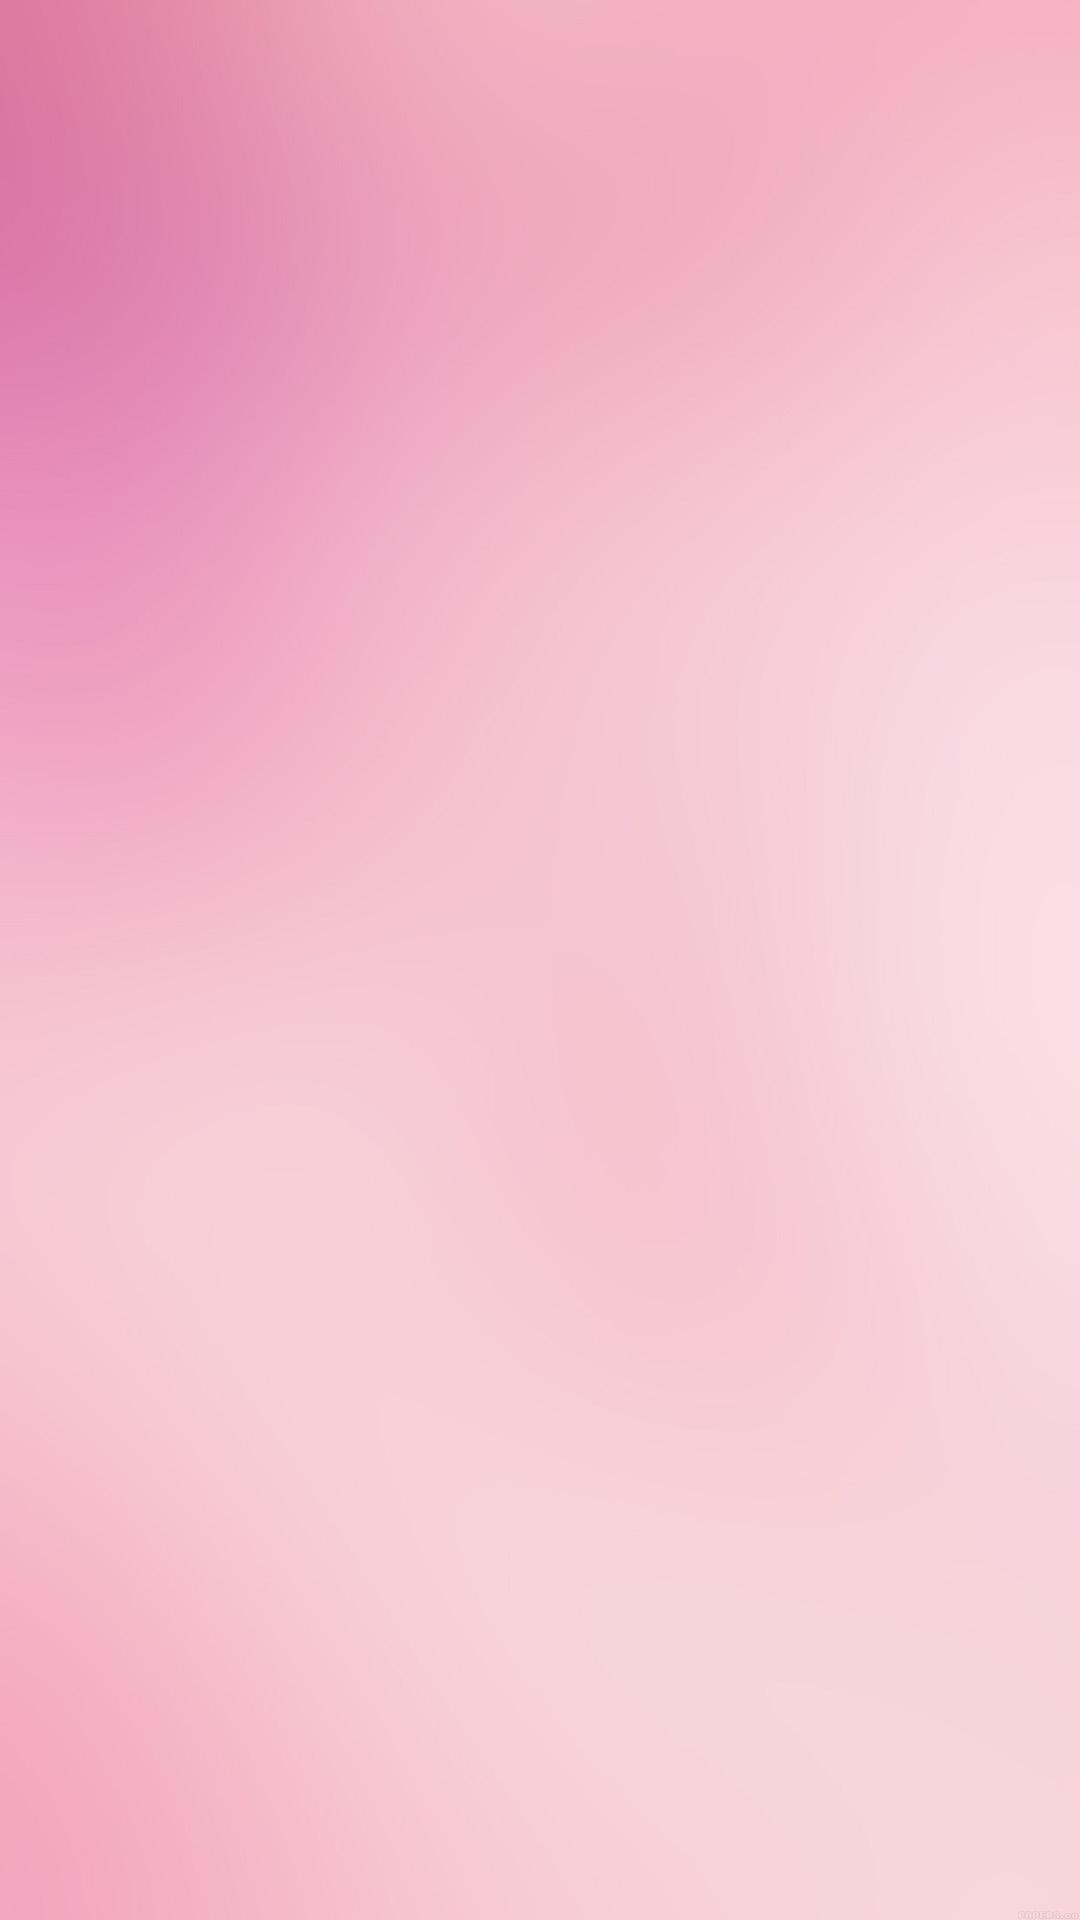 Spring Wallpaper Iphone 4 春のピンク色iphone壁紙 Iphonex スマホ壁紙 待受画像ギャラリー